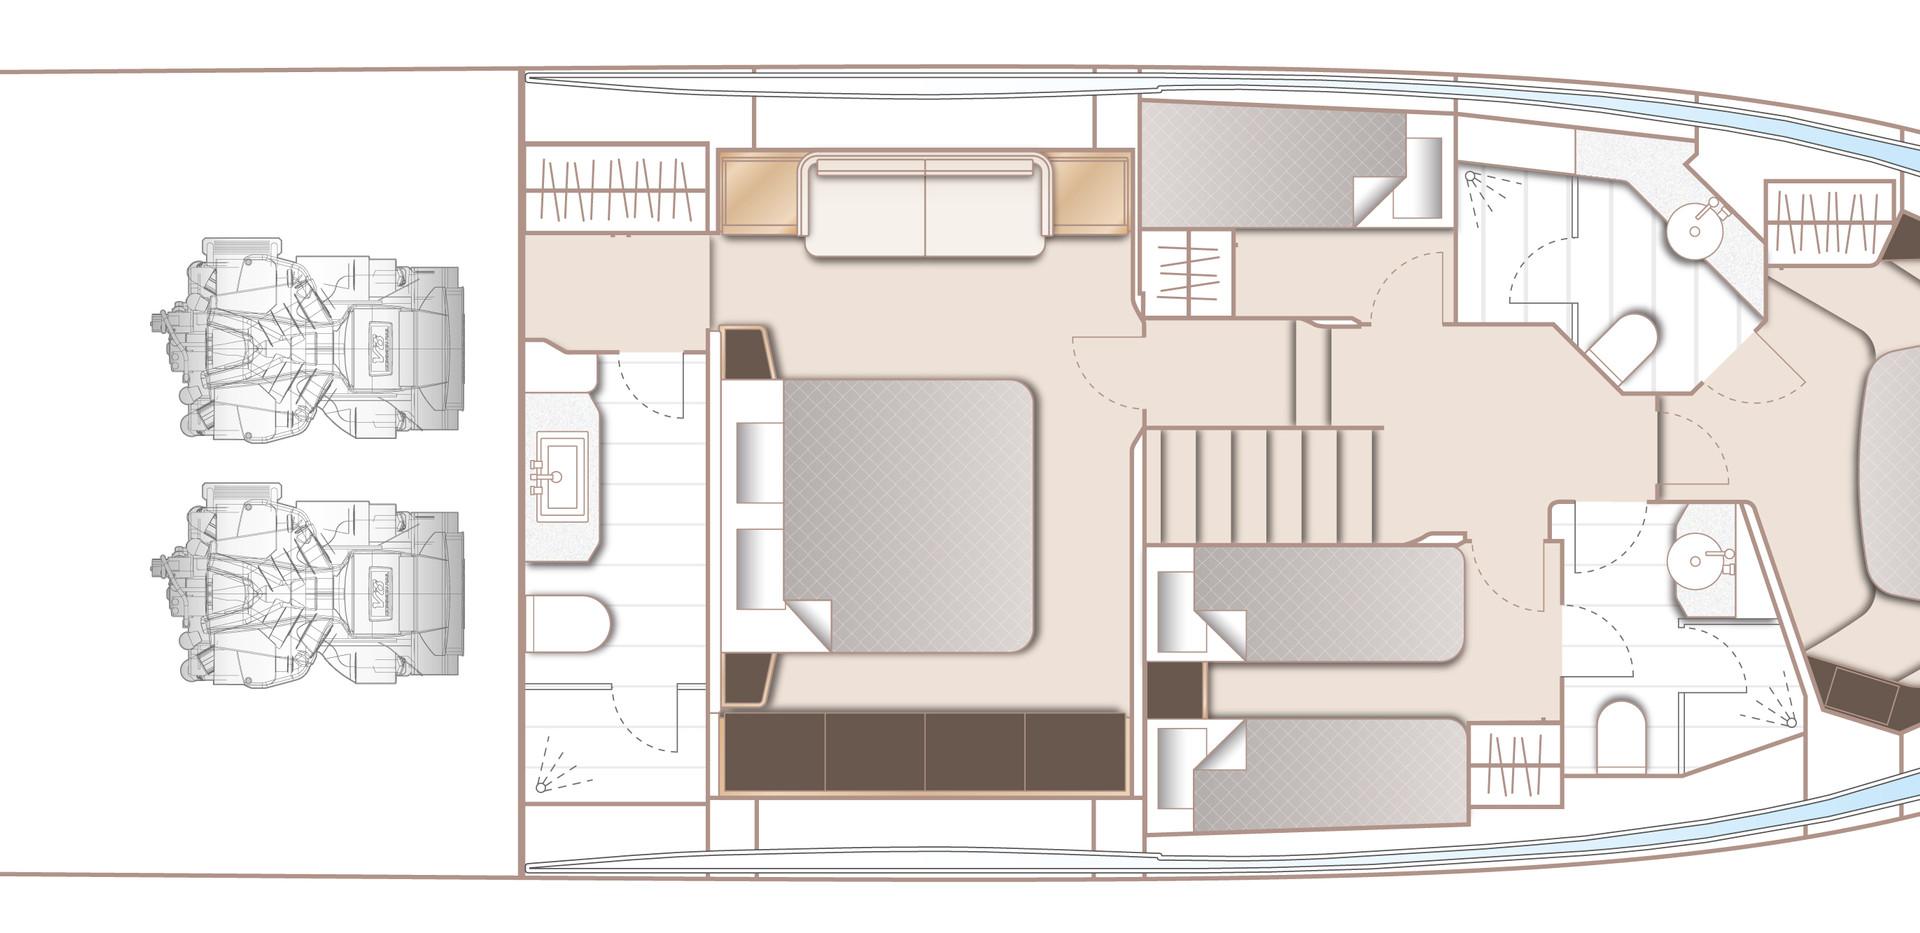 s66-layout-lower-deck.jpg